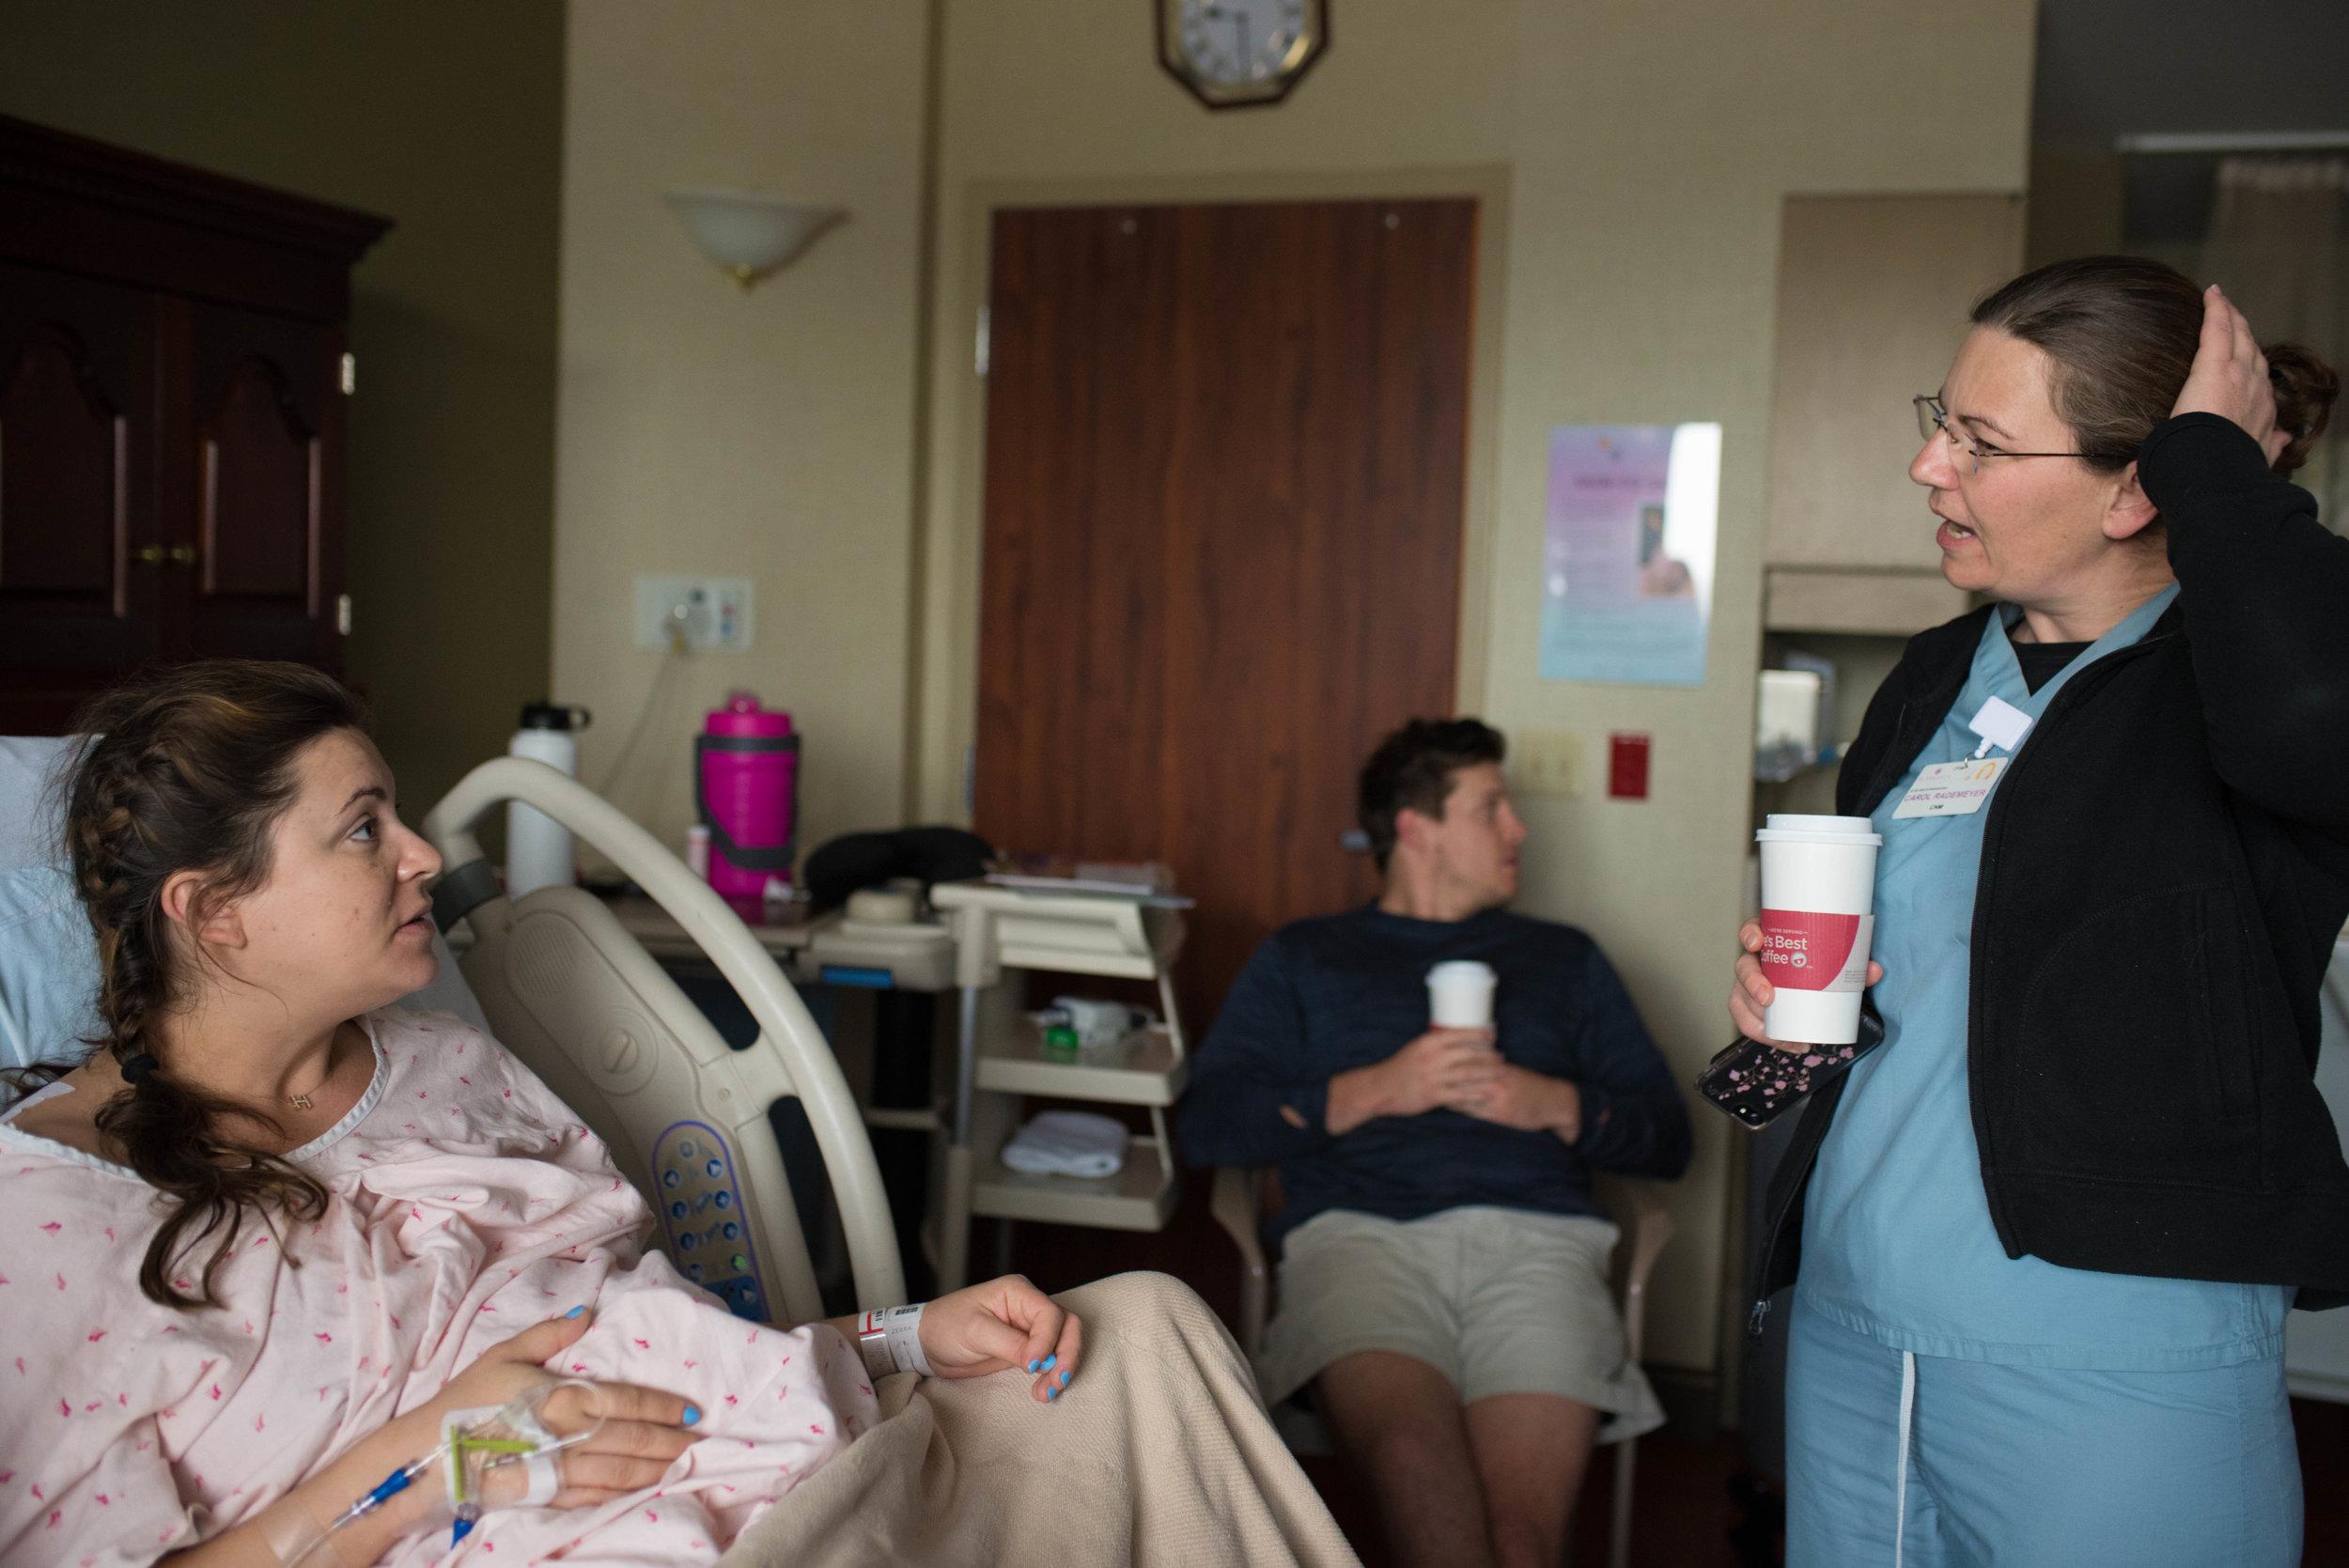 060-Full-Circle-st-vincents-southside-hospital-birth-jacksonville.jpg